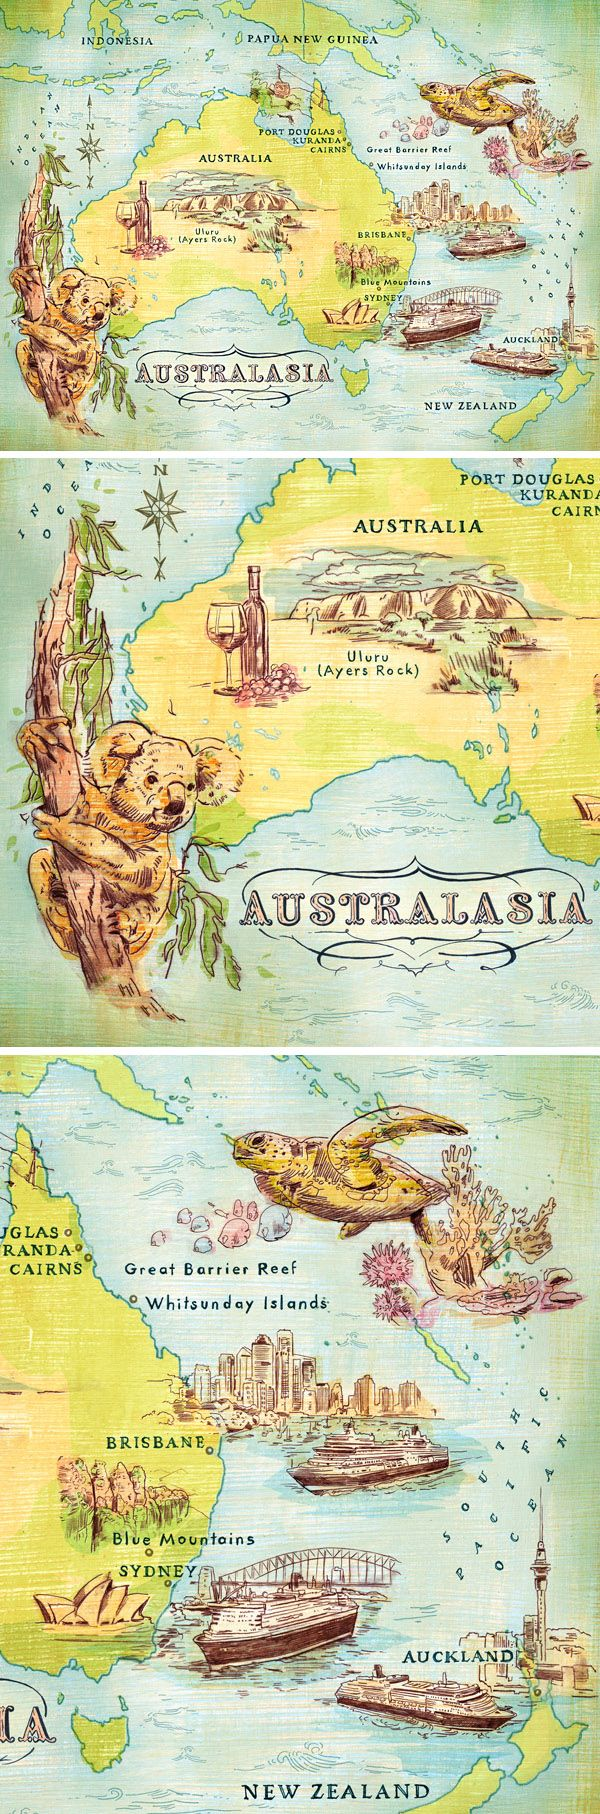 Australasia Map - Jacqui Oakley Illustration